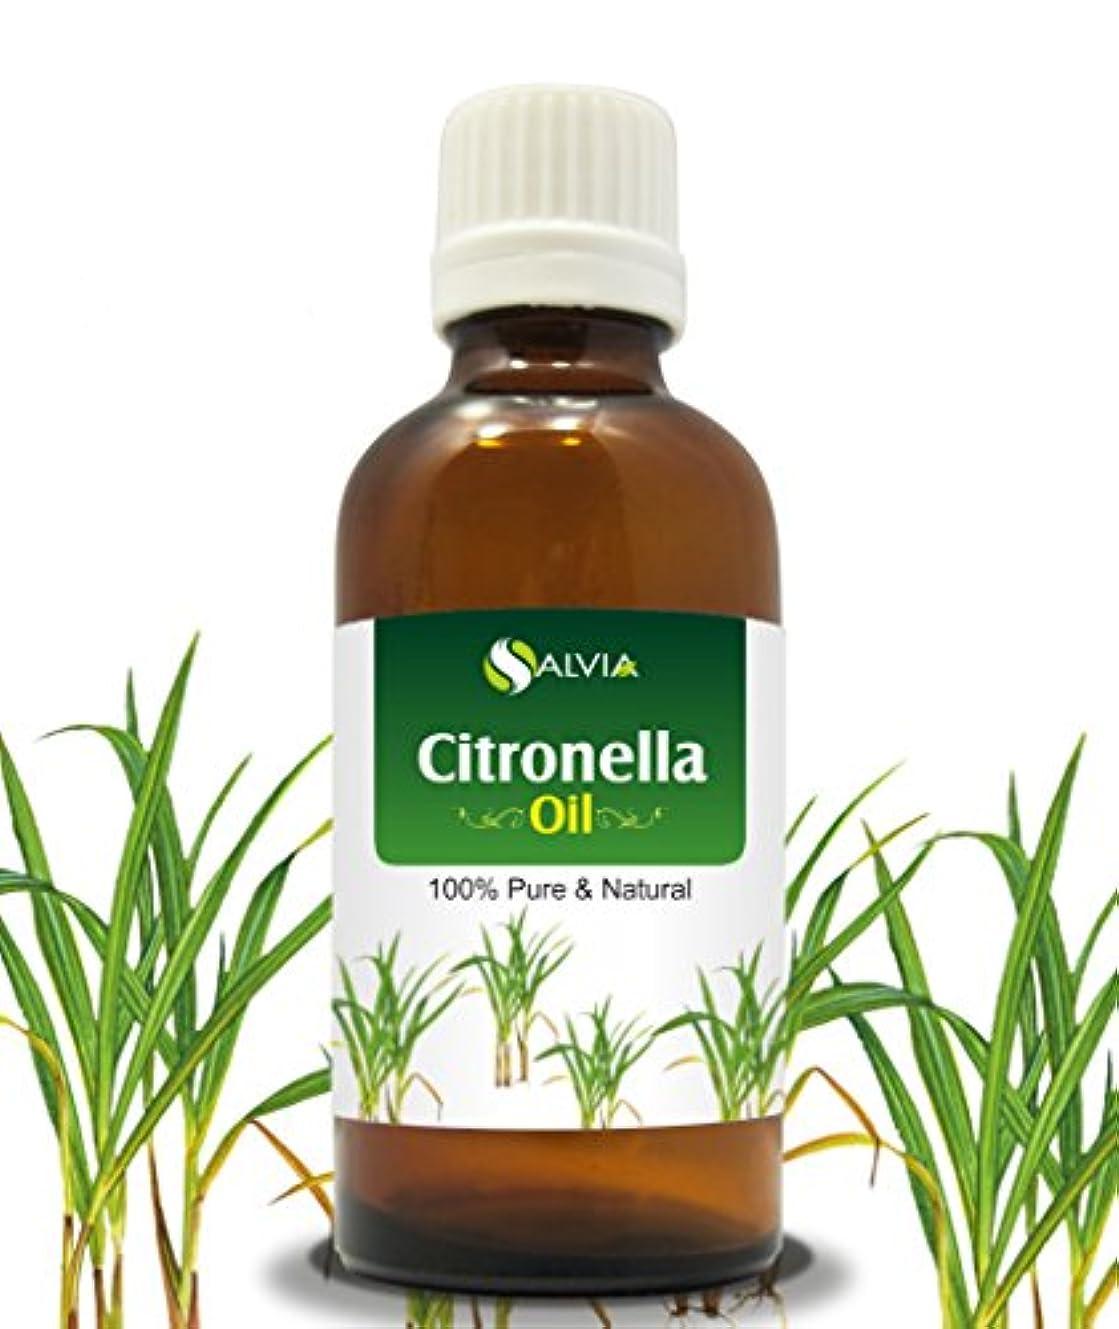 CITRONELLA OIL 100% NATURAL PURE UNDILUTED UNCUT ESSENTIAL OIL 15ML